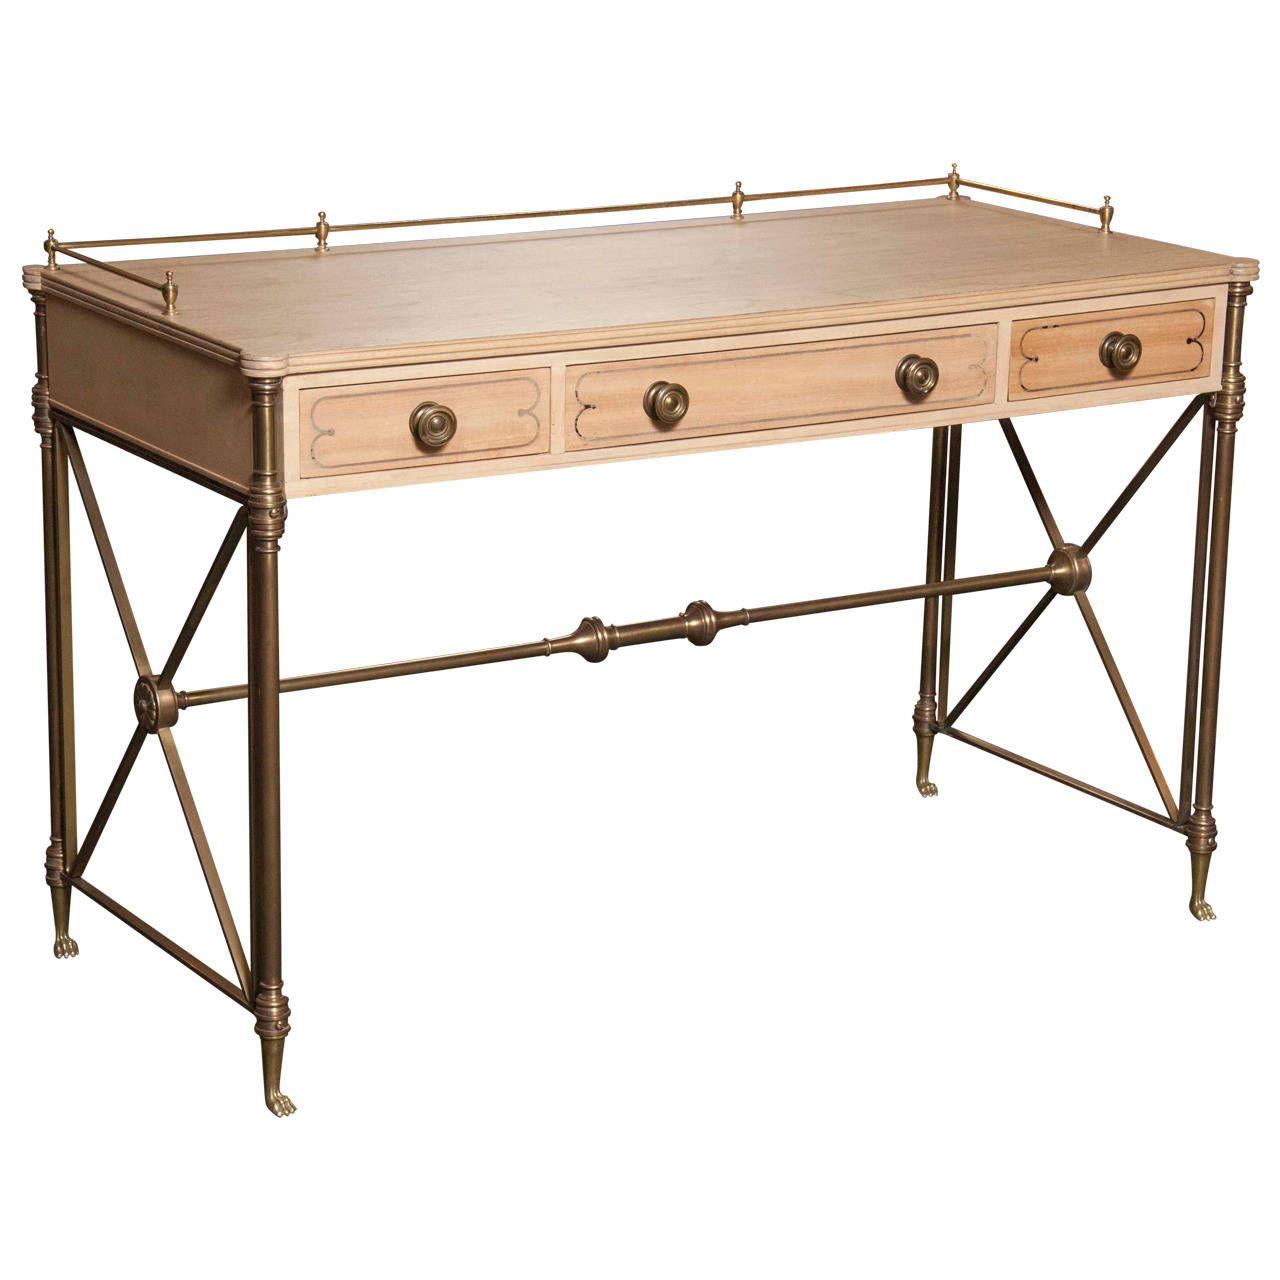 Regency Style Campaign Desk - Regency Style Campaign Desk Campaign Desk, Regency And Desks